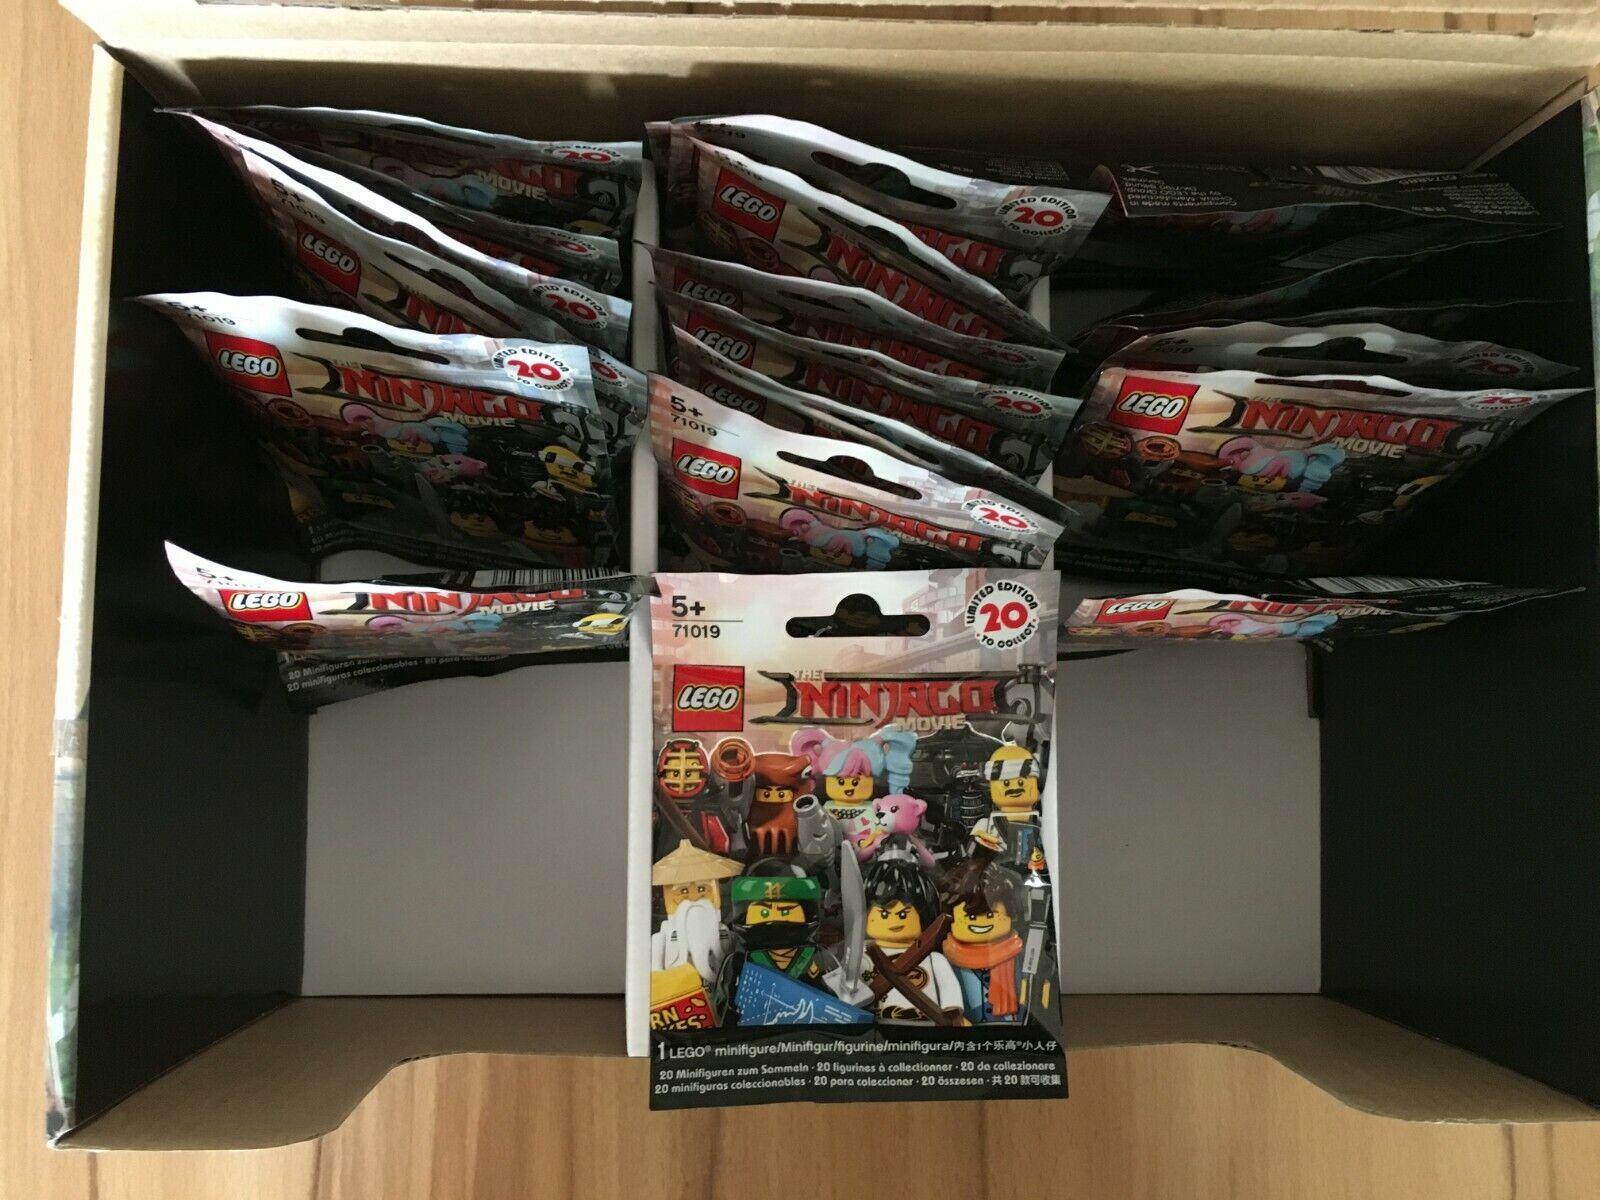 LEGO Ninjago Movie Minifiguren - 71019 71019 71019 - 20 Stück - NEU und OVP 1247a7